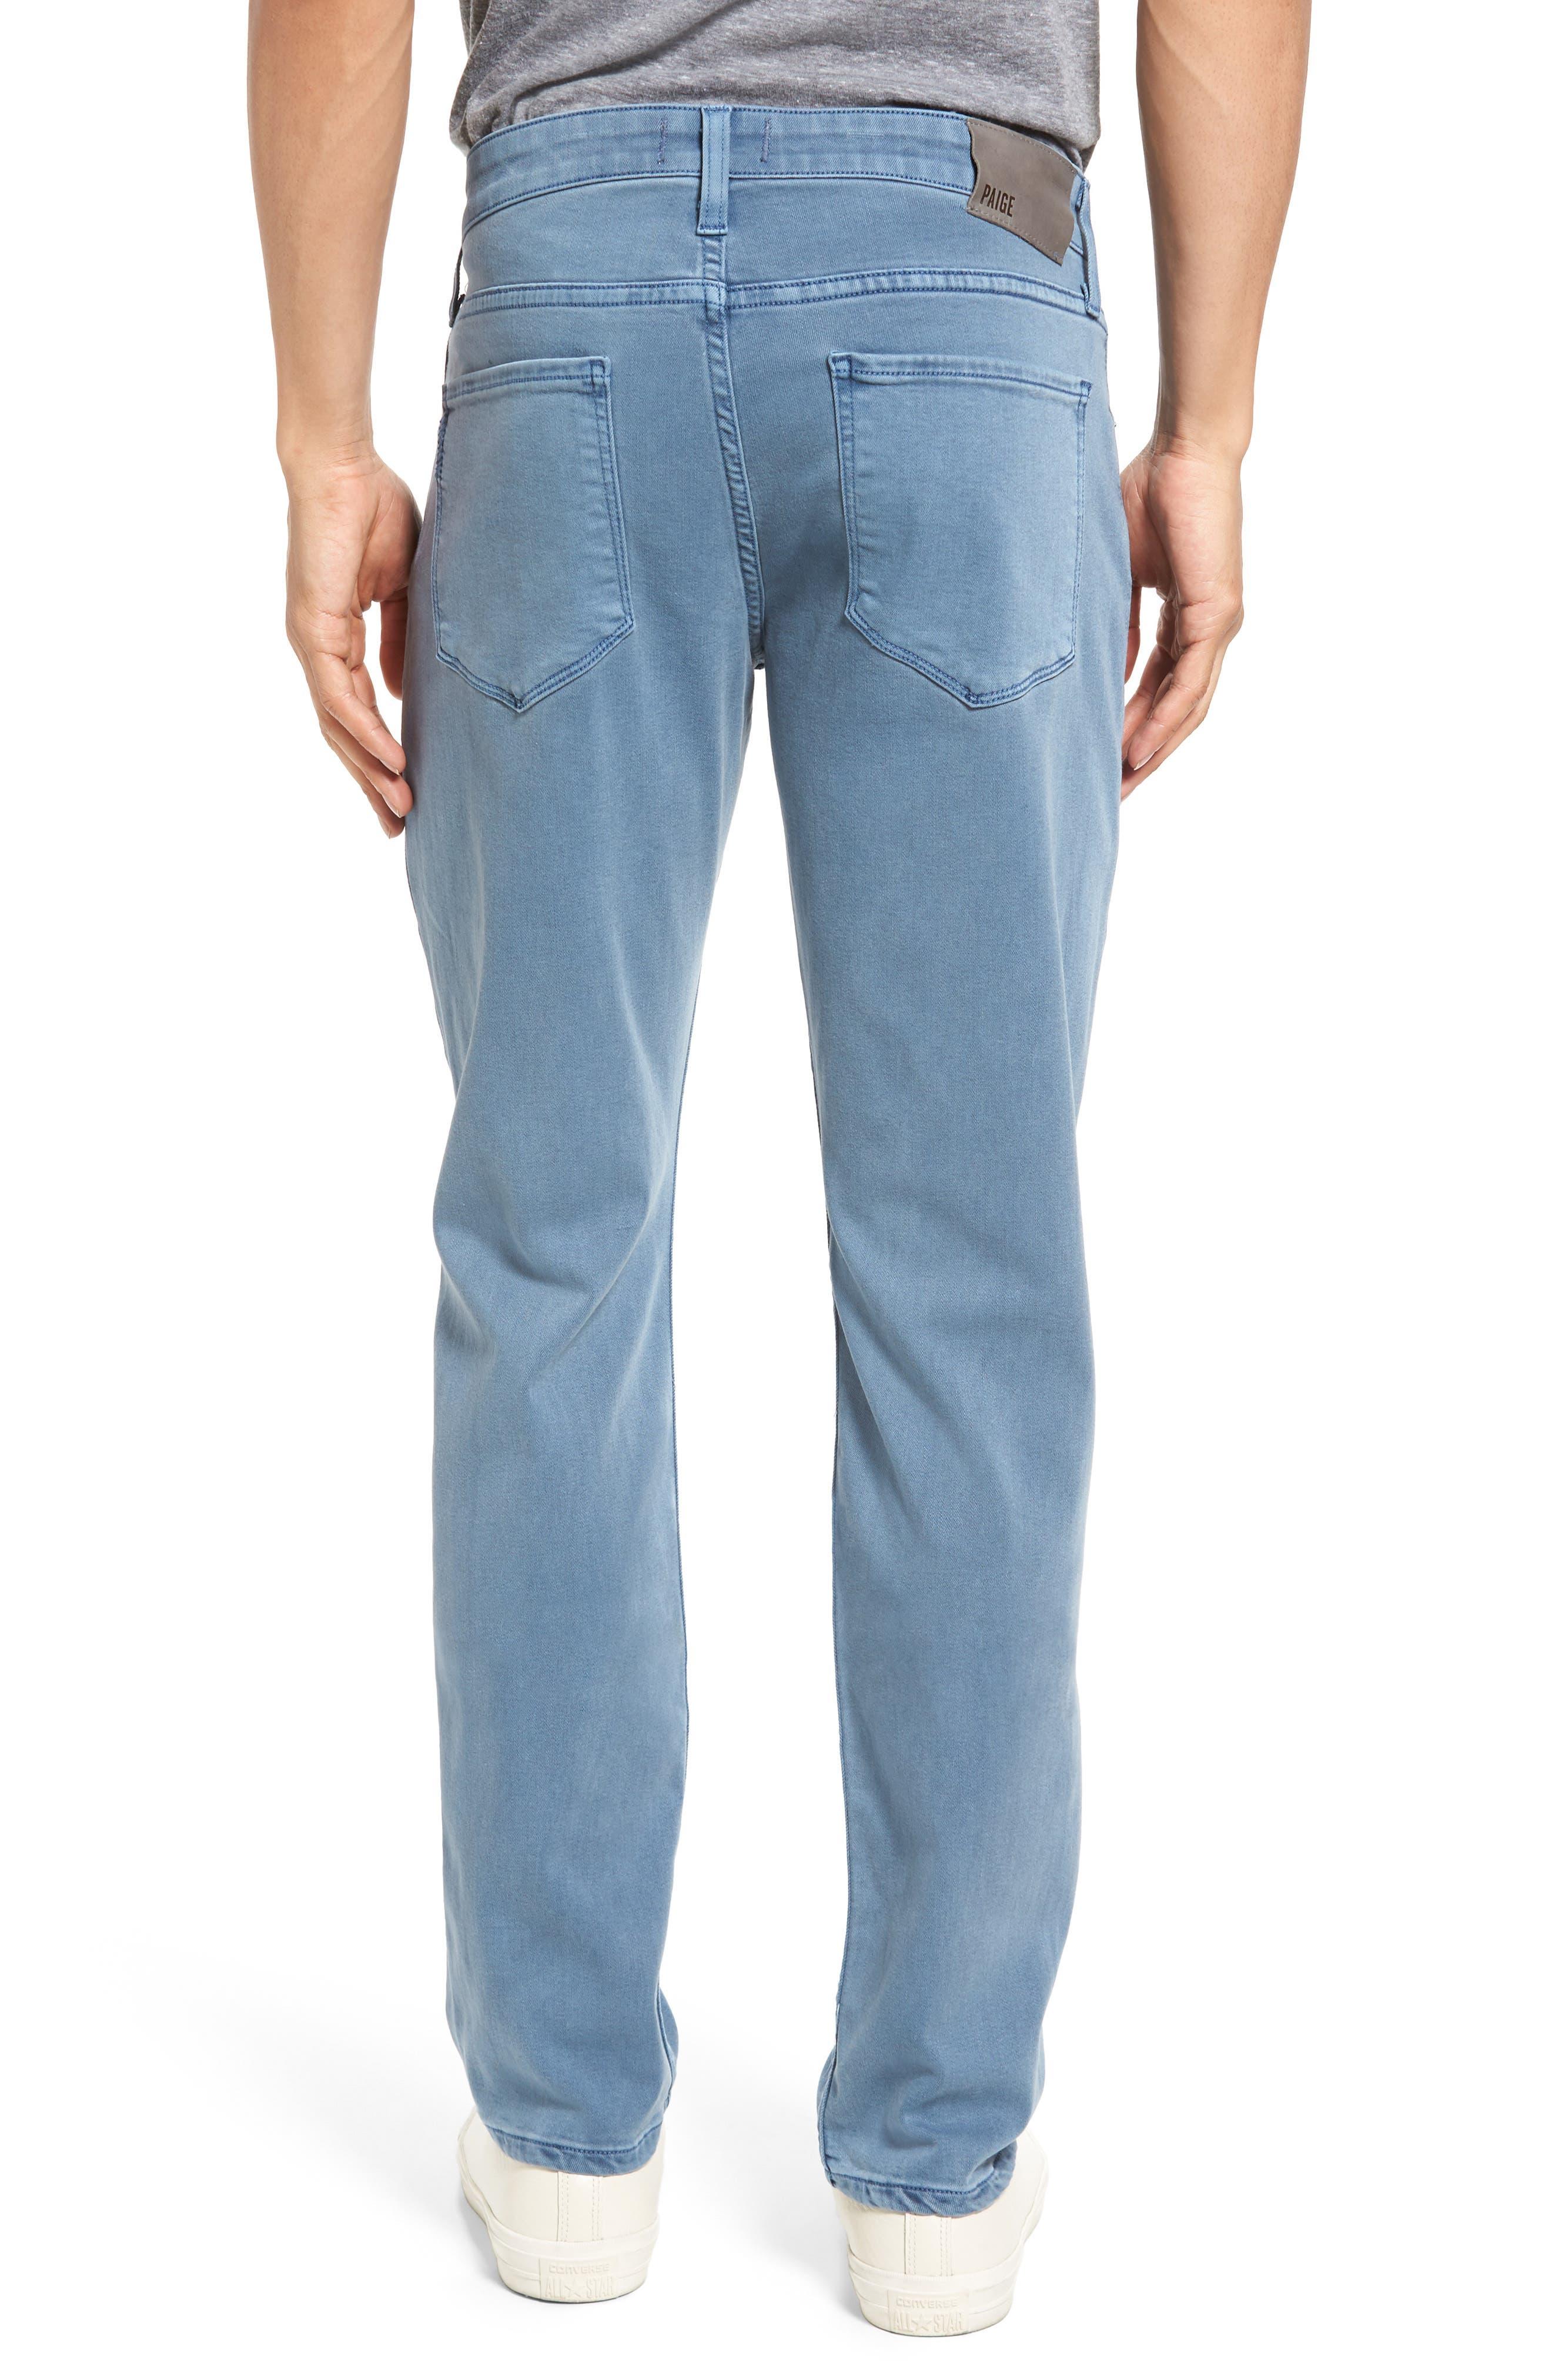 Transcend - Lennox Slim Fit Jeans,                             Alternate thumbnail 2, color,                             430